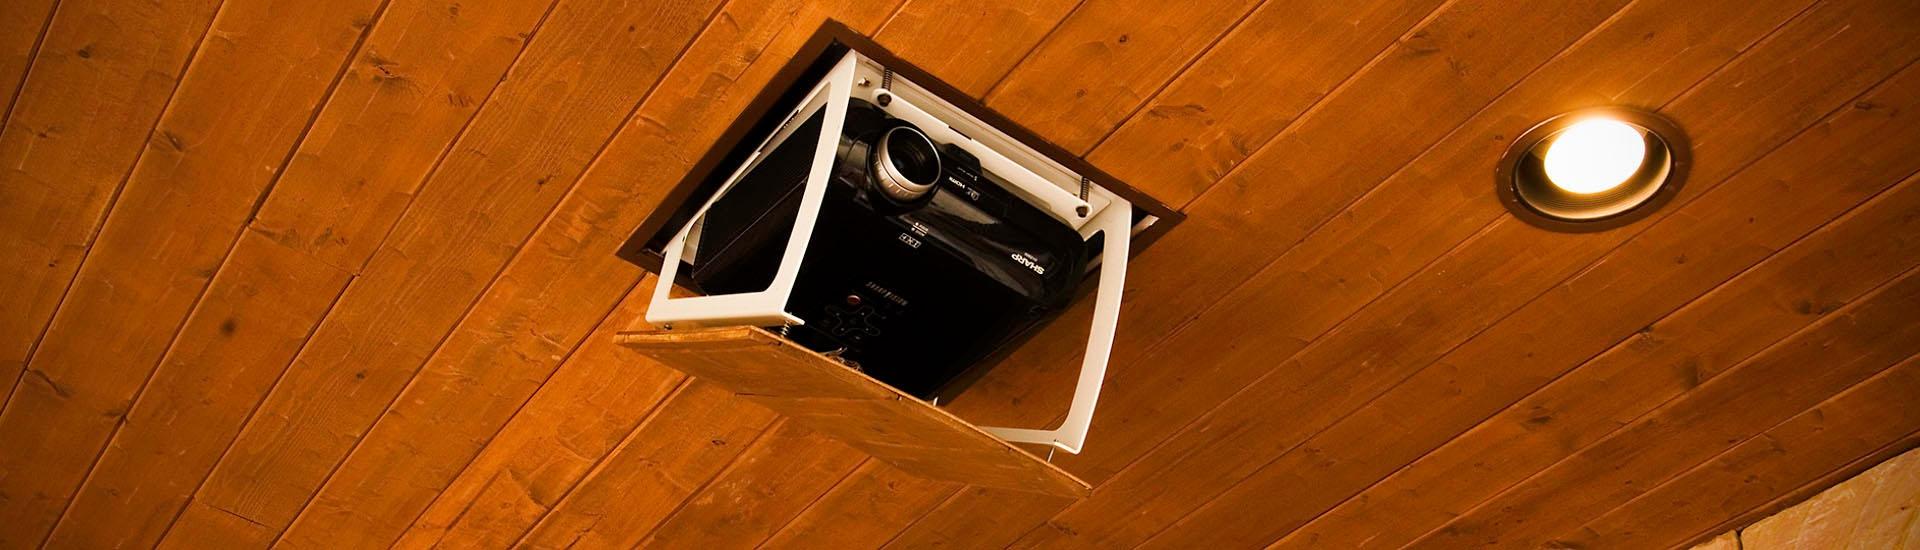 Phantom Projector Lift Residential Installation Dealer Harmony Interiors Asheville Nc